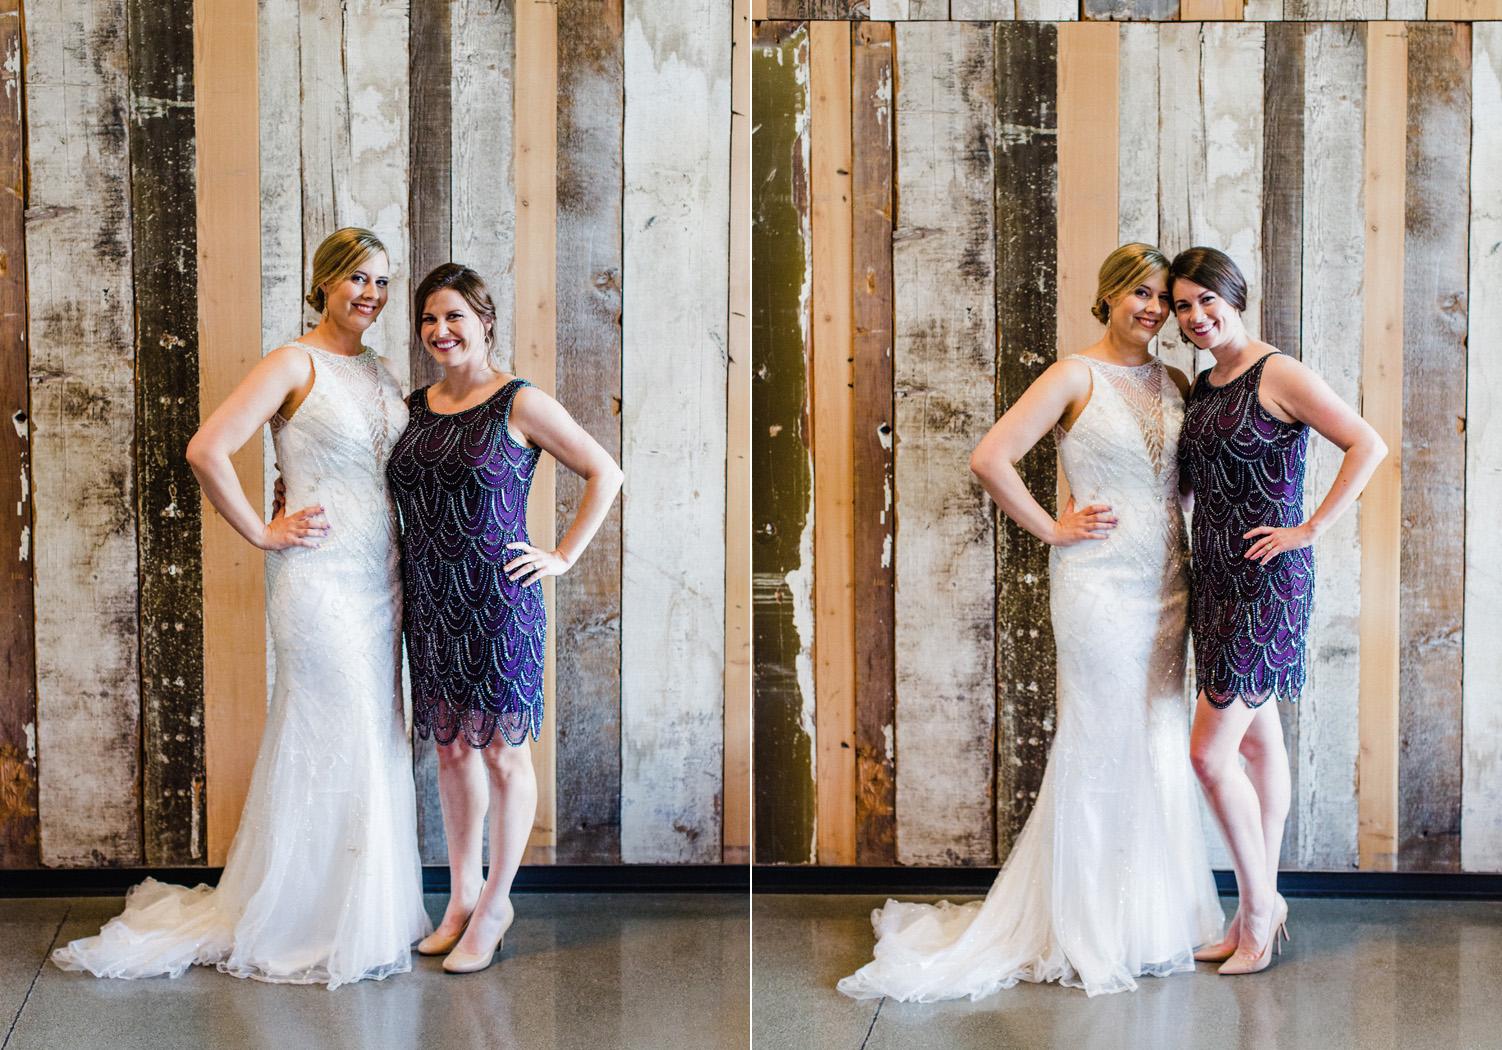 Seattle purple bridesmaid dresses Wedding Photography.jpg